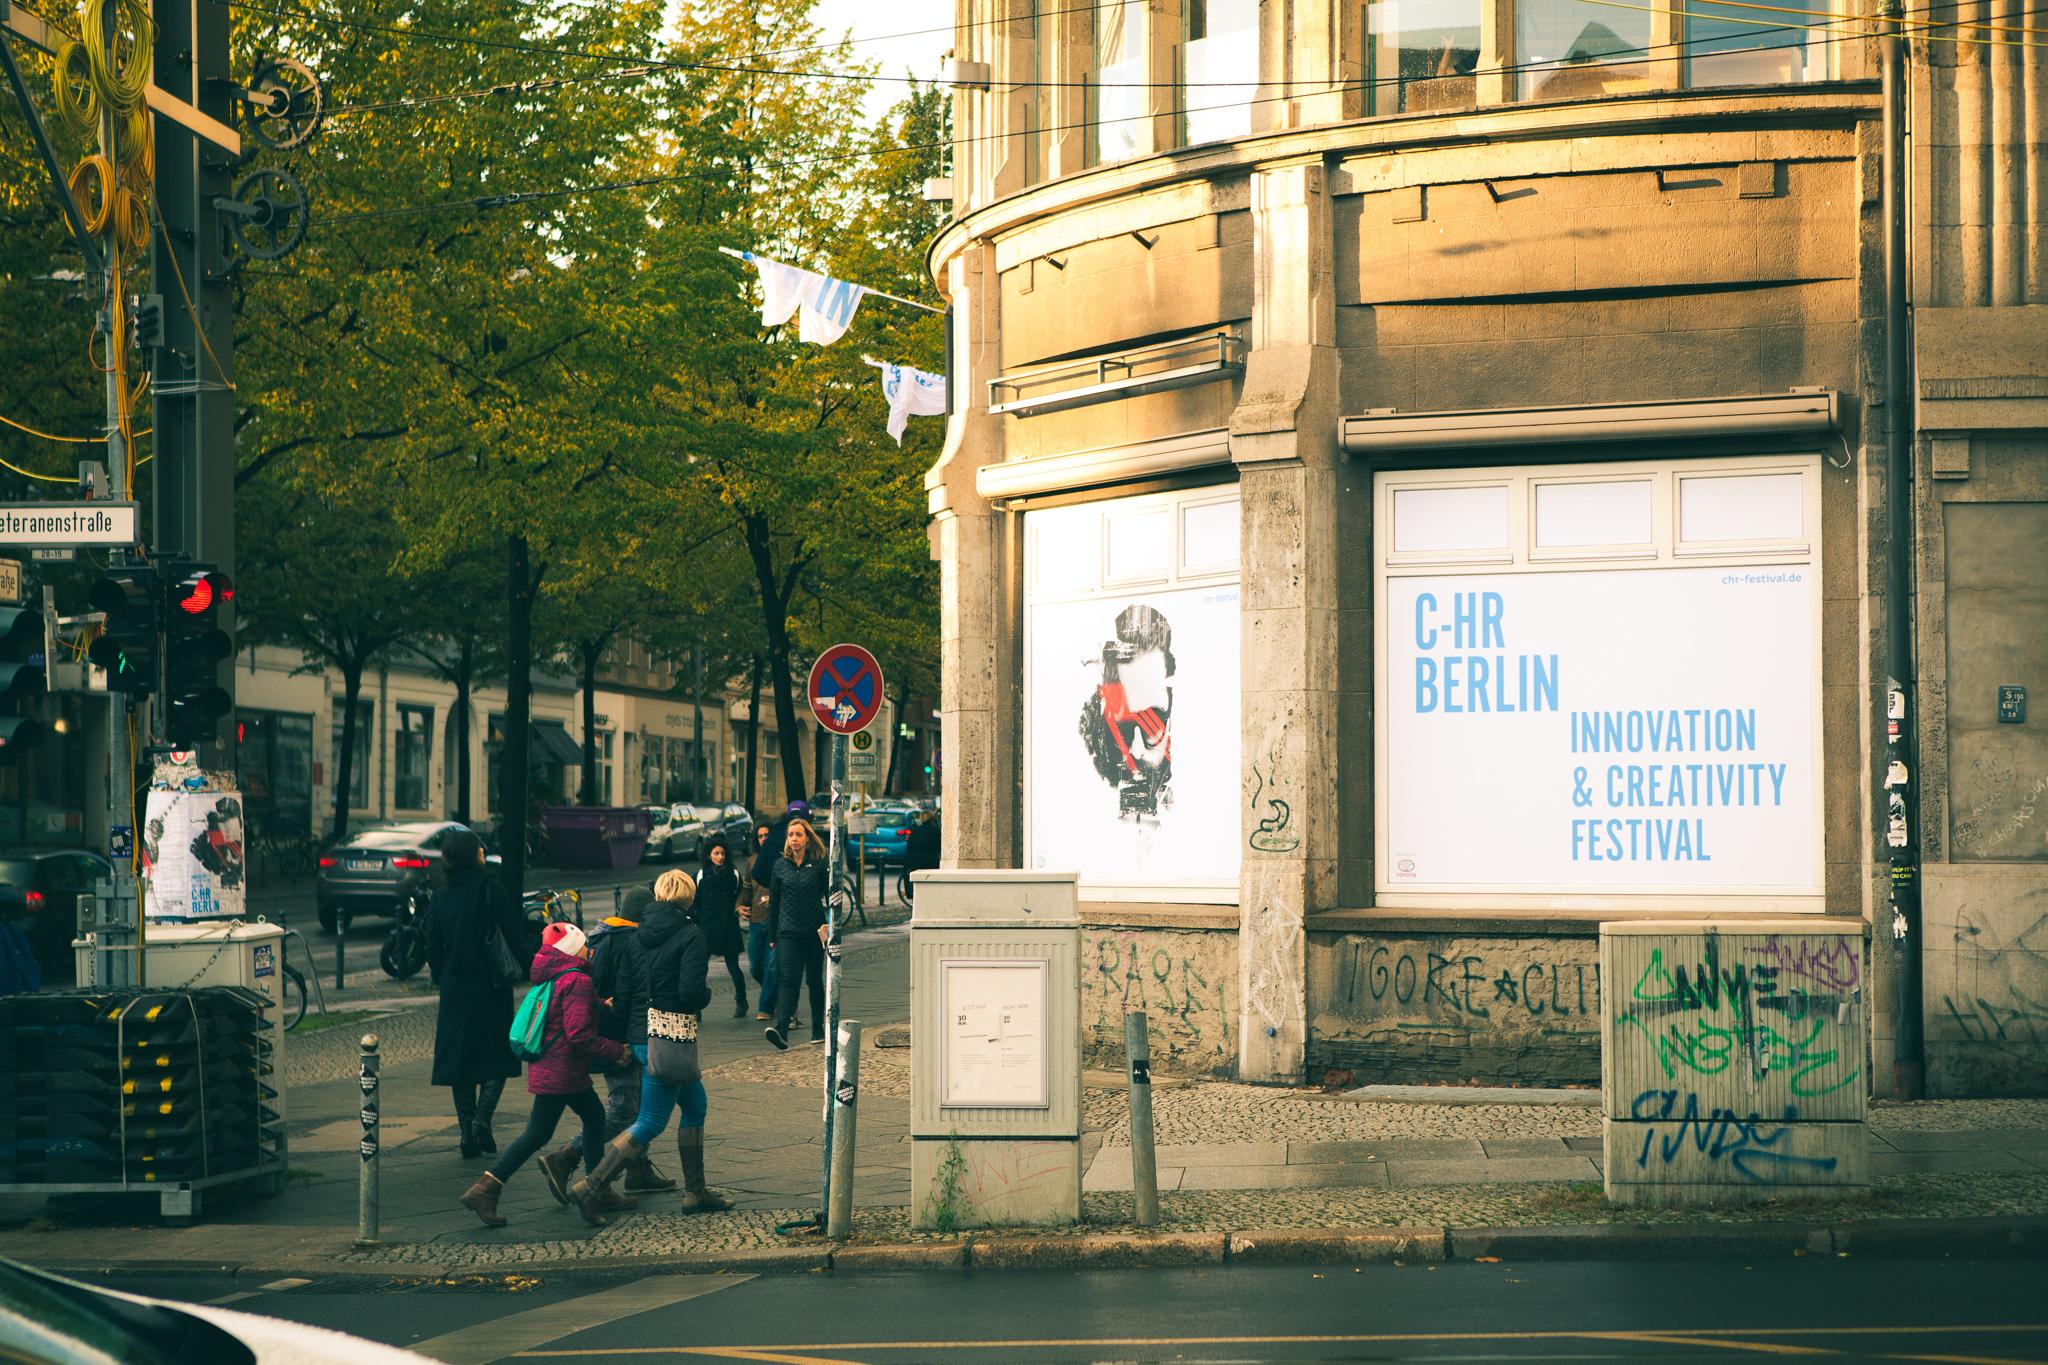 C-HR_BERLIN_Festival-0037.jpg